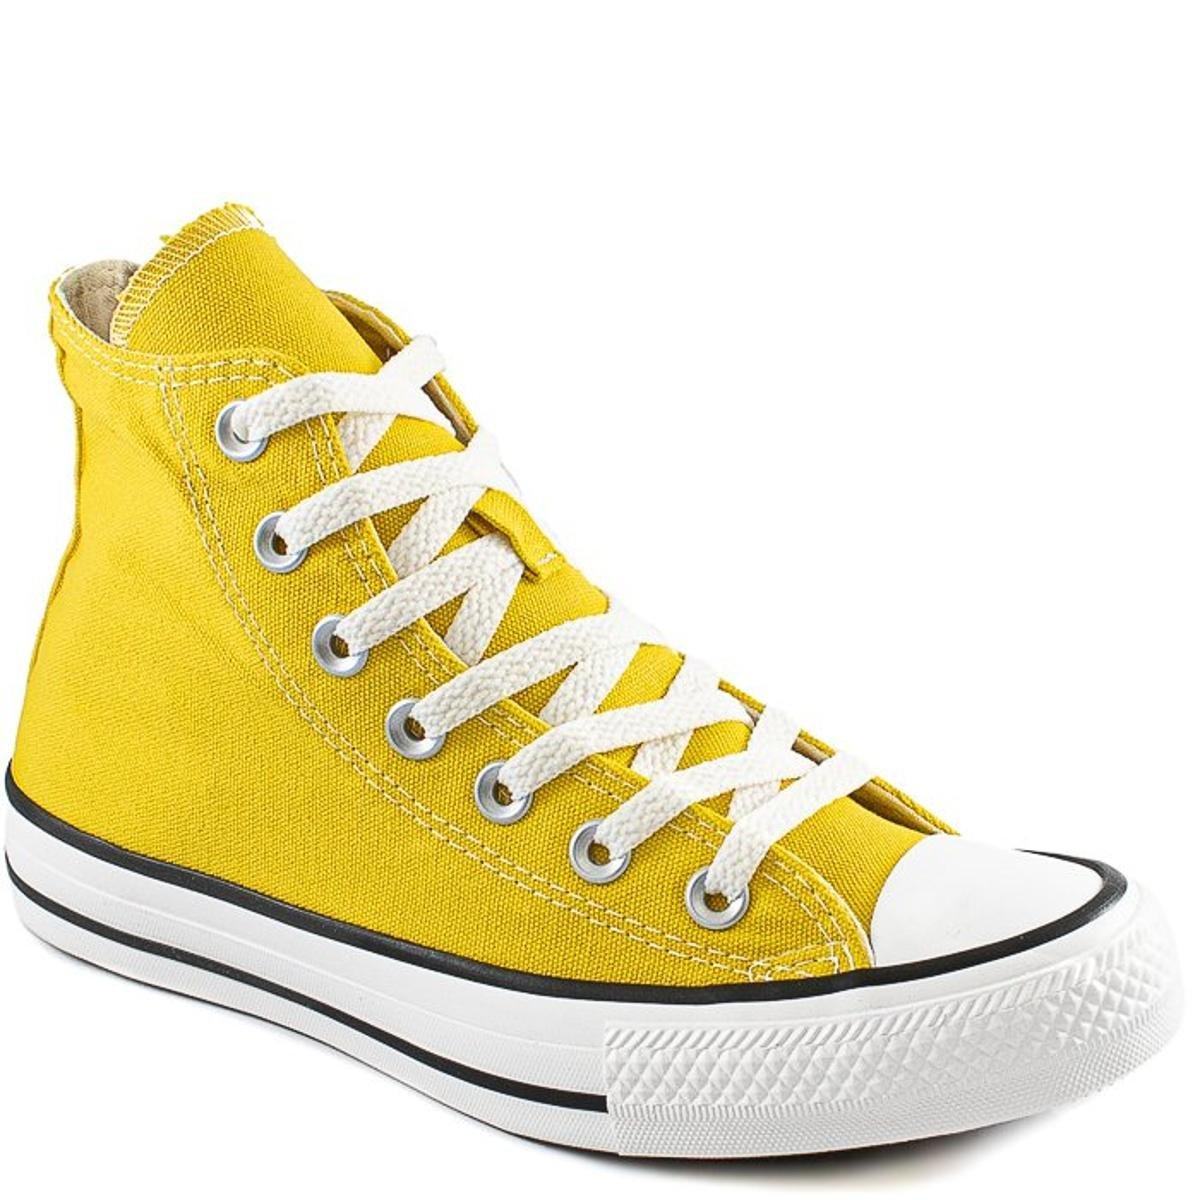 Tênis Converse Chuck Taylor All Star Cano Alto Feminino Amarelo